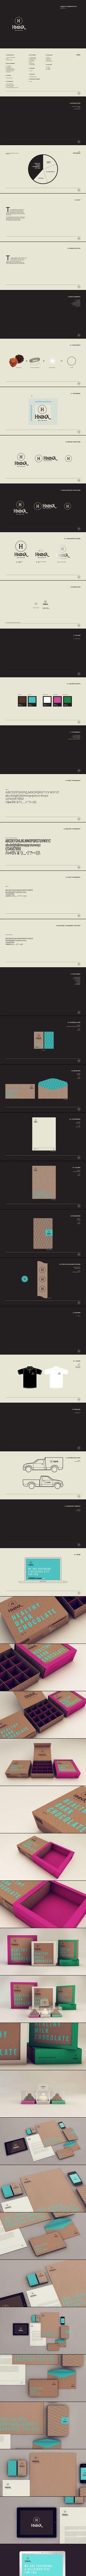 brand book http://www.behance.net/gallery/Hnina-Healthy-Chocolates-Directors-cut/6532085